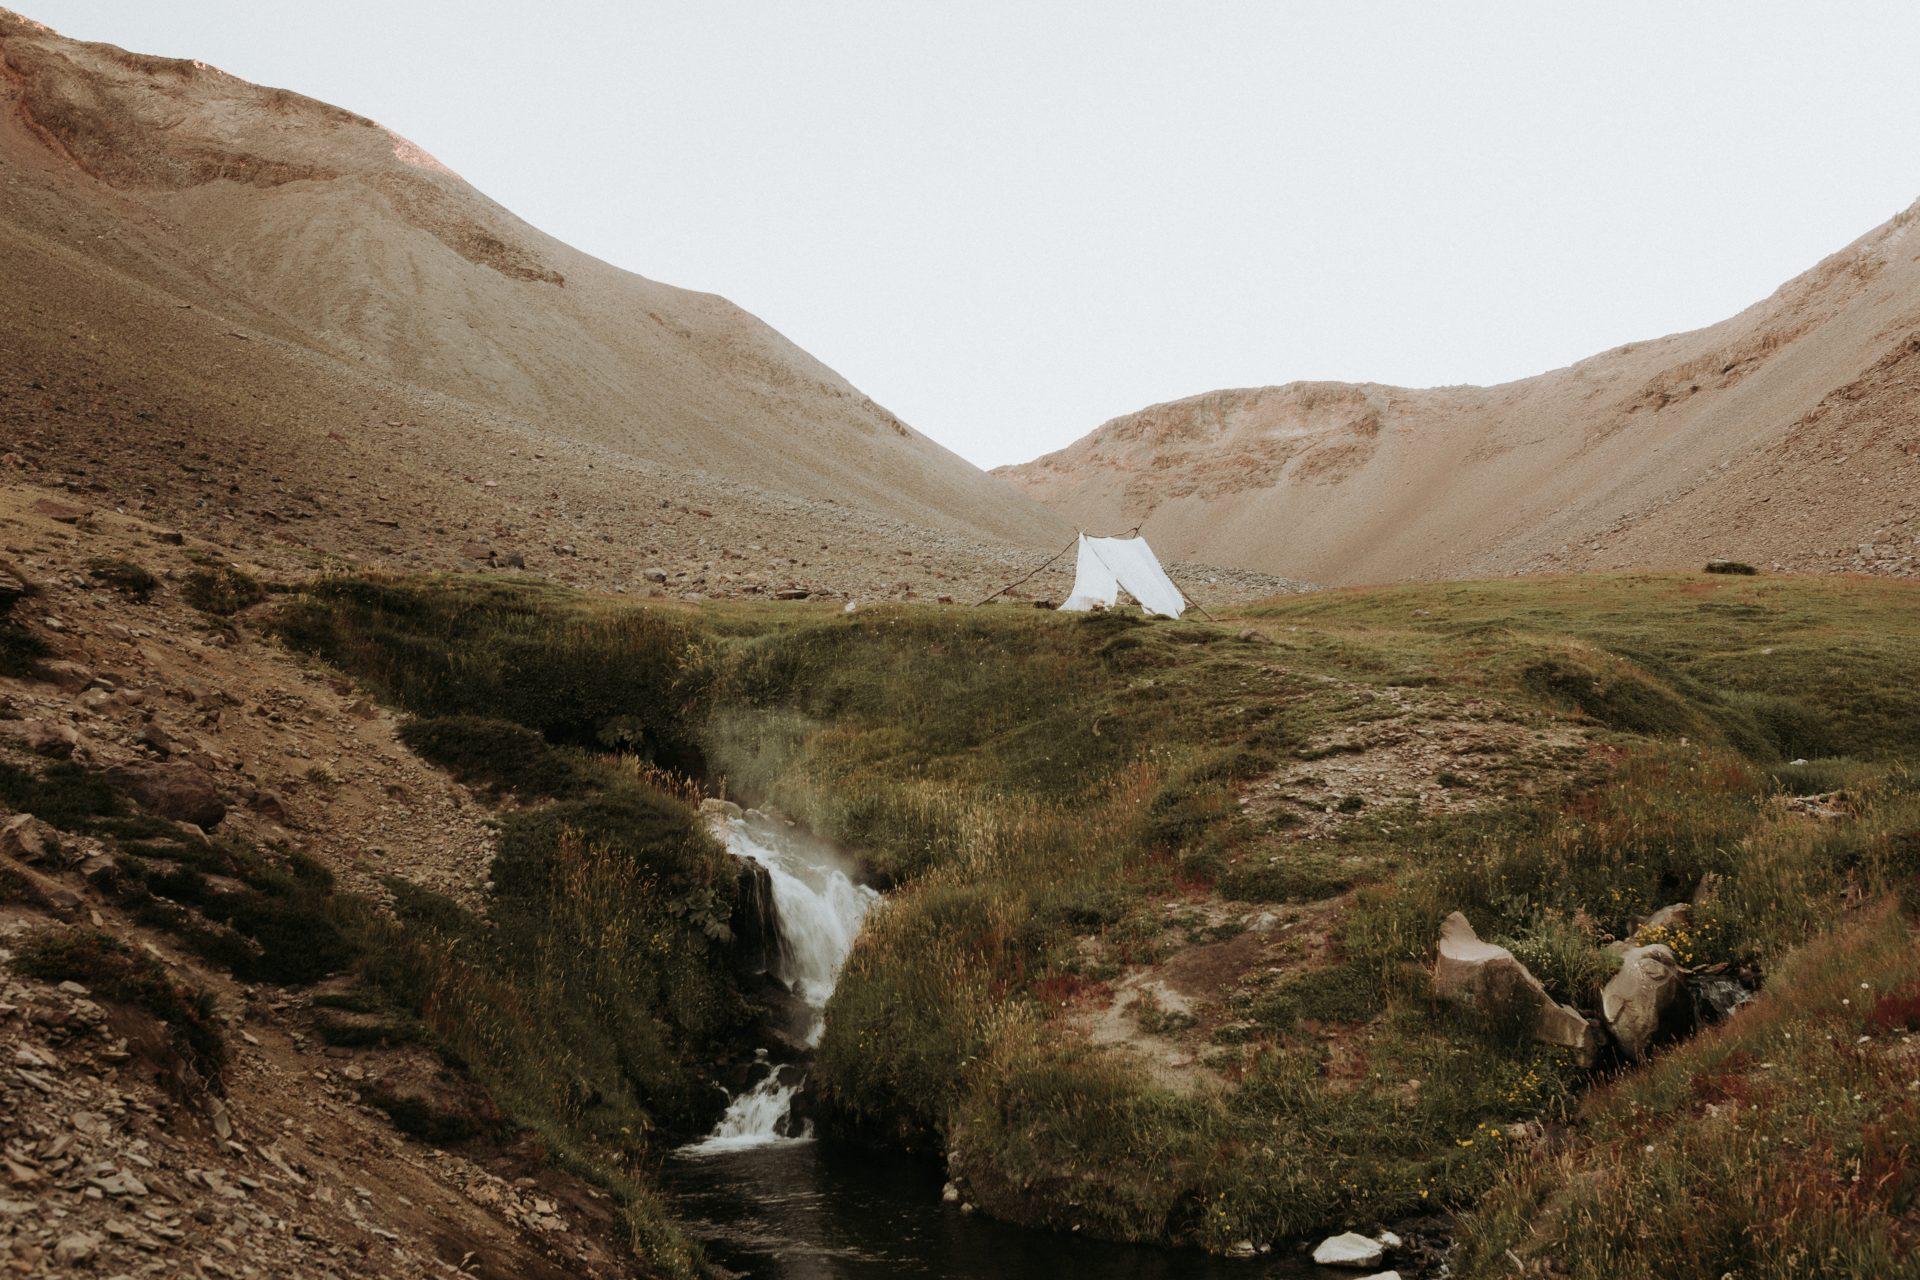 Campsite of Adventure wedding in Chile